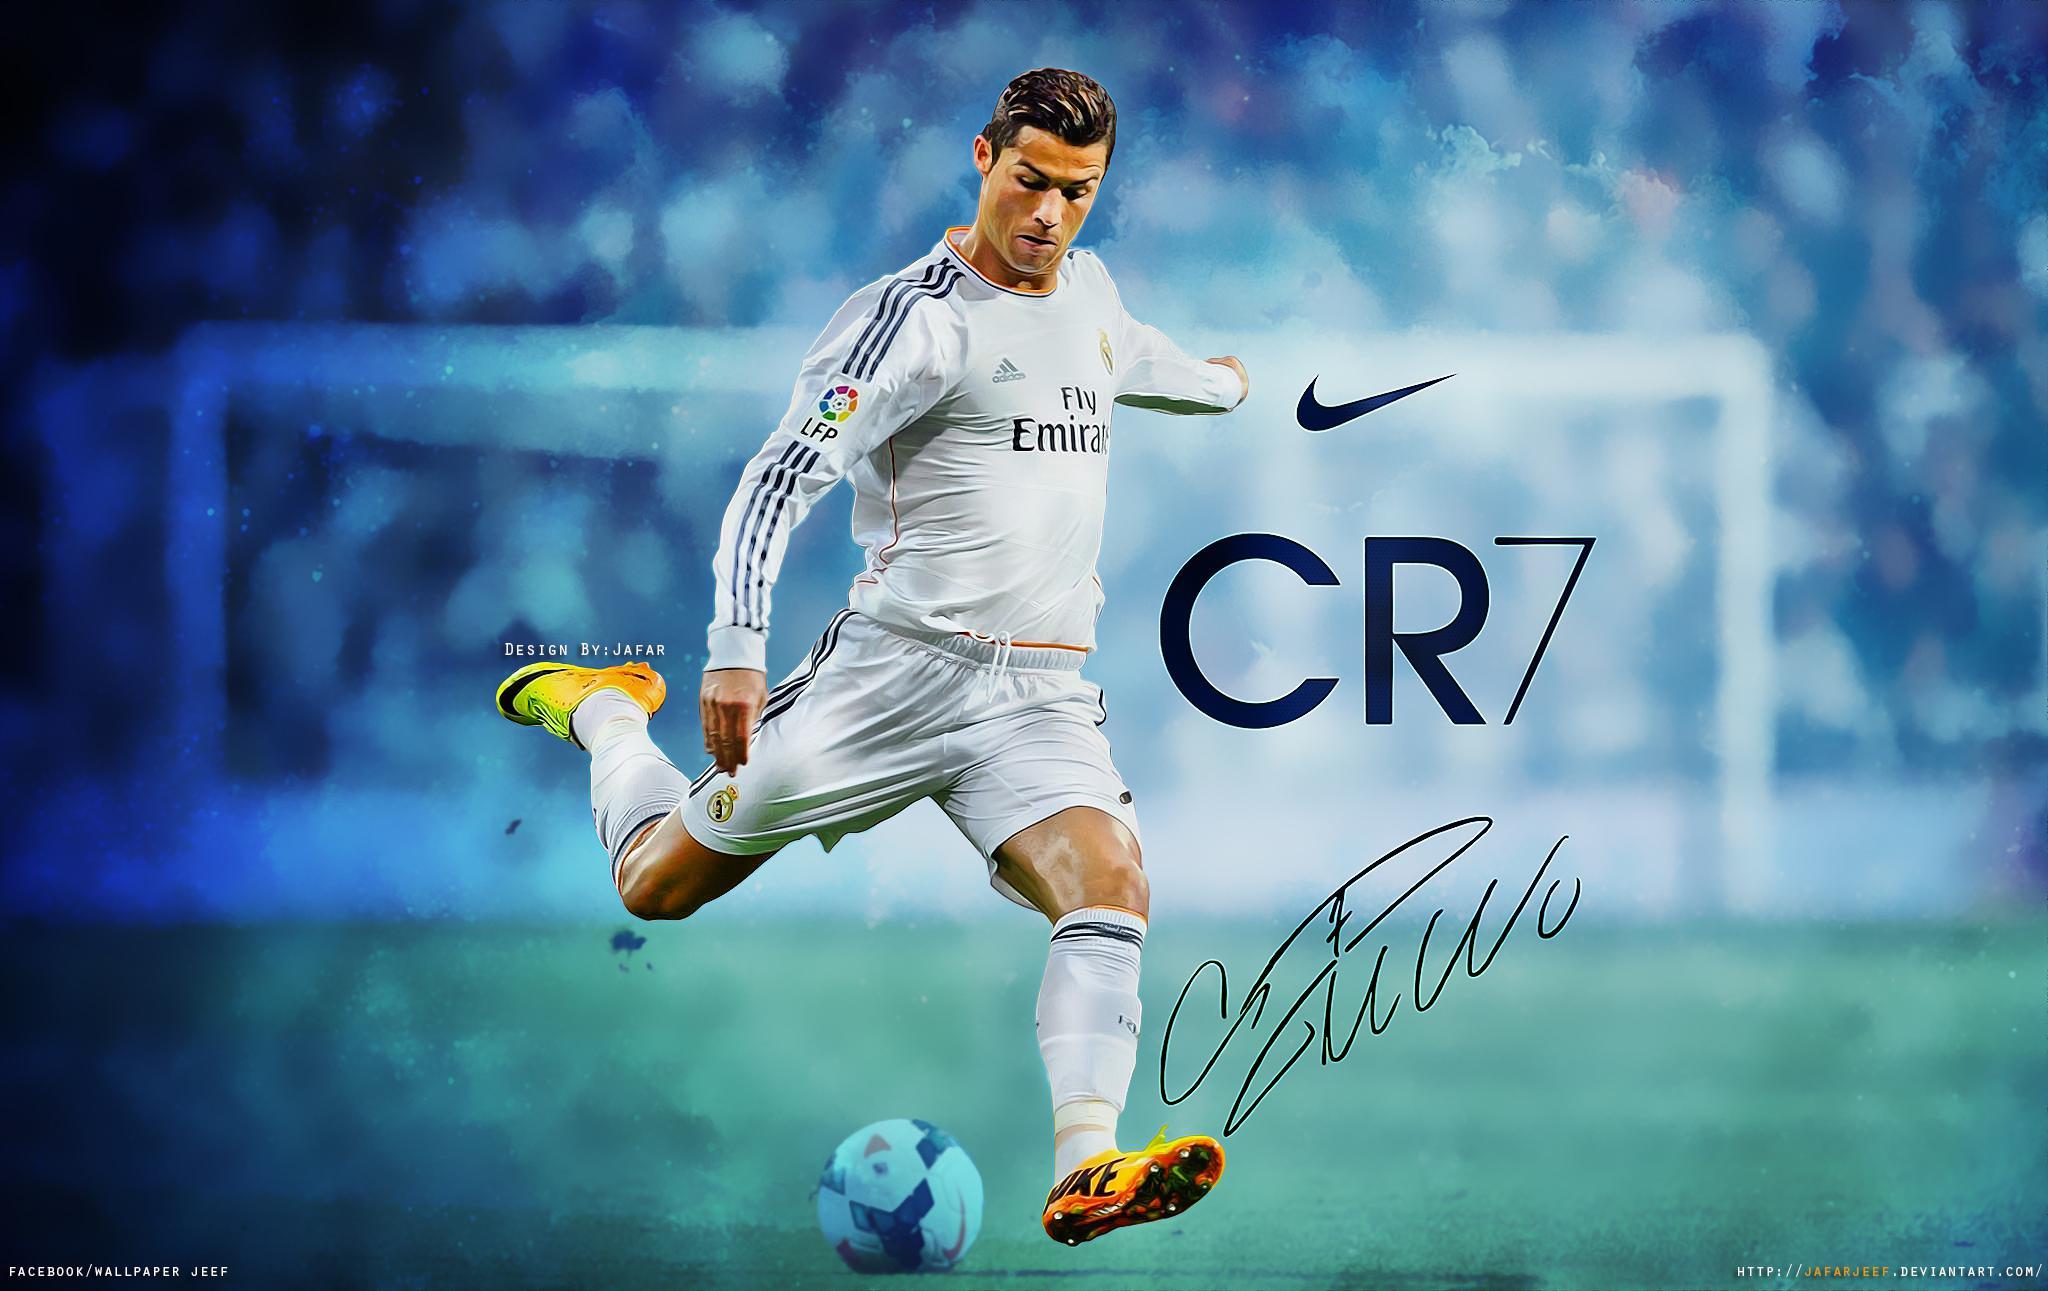 Wallpapers Images Photos pour football ronaldo 2015 2048x1291